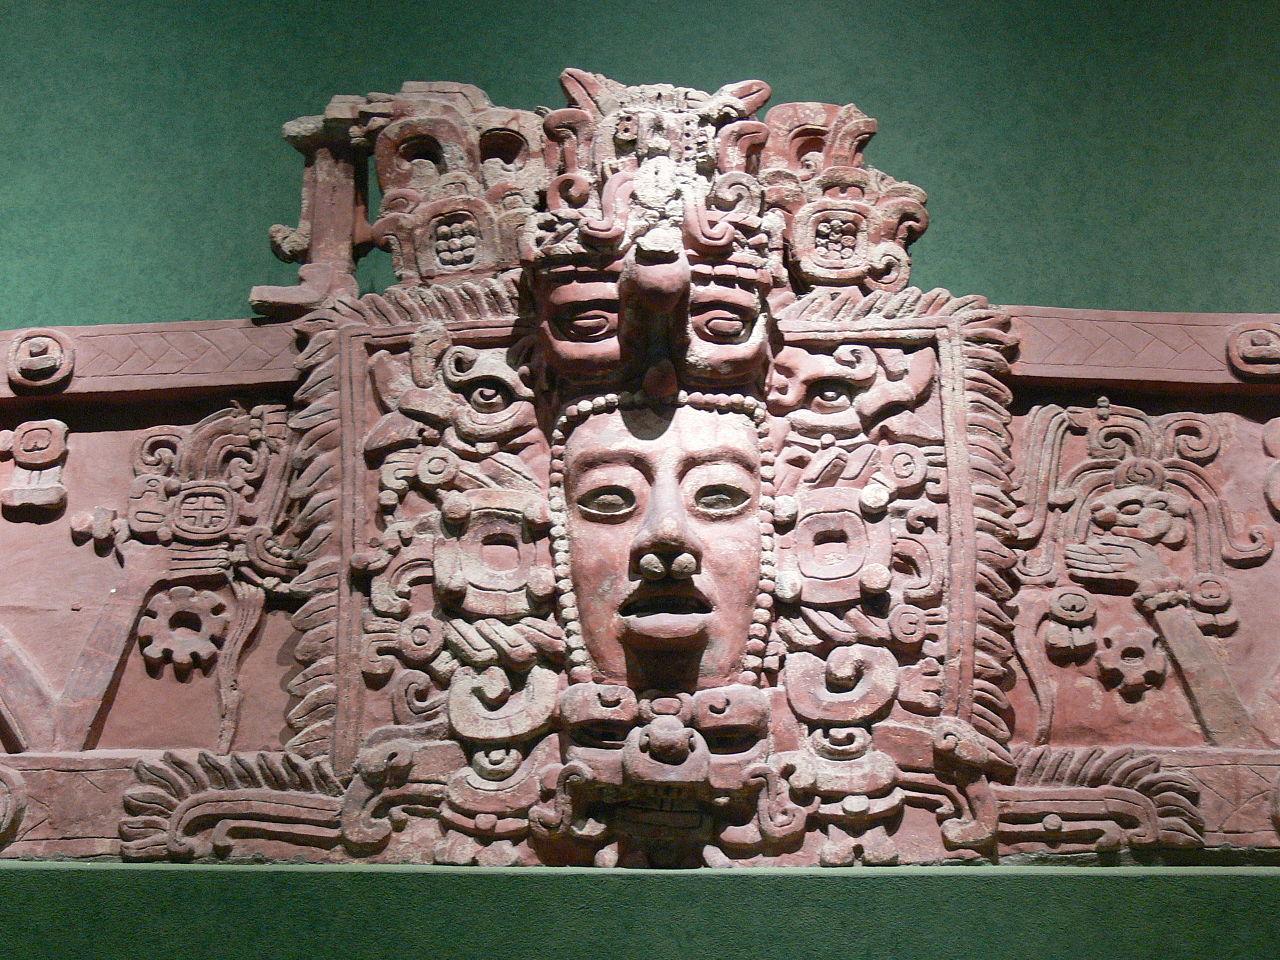 Cuello Mayan Ruins in Belize